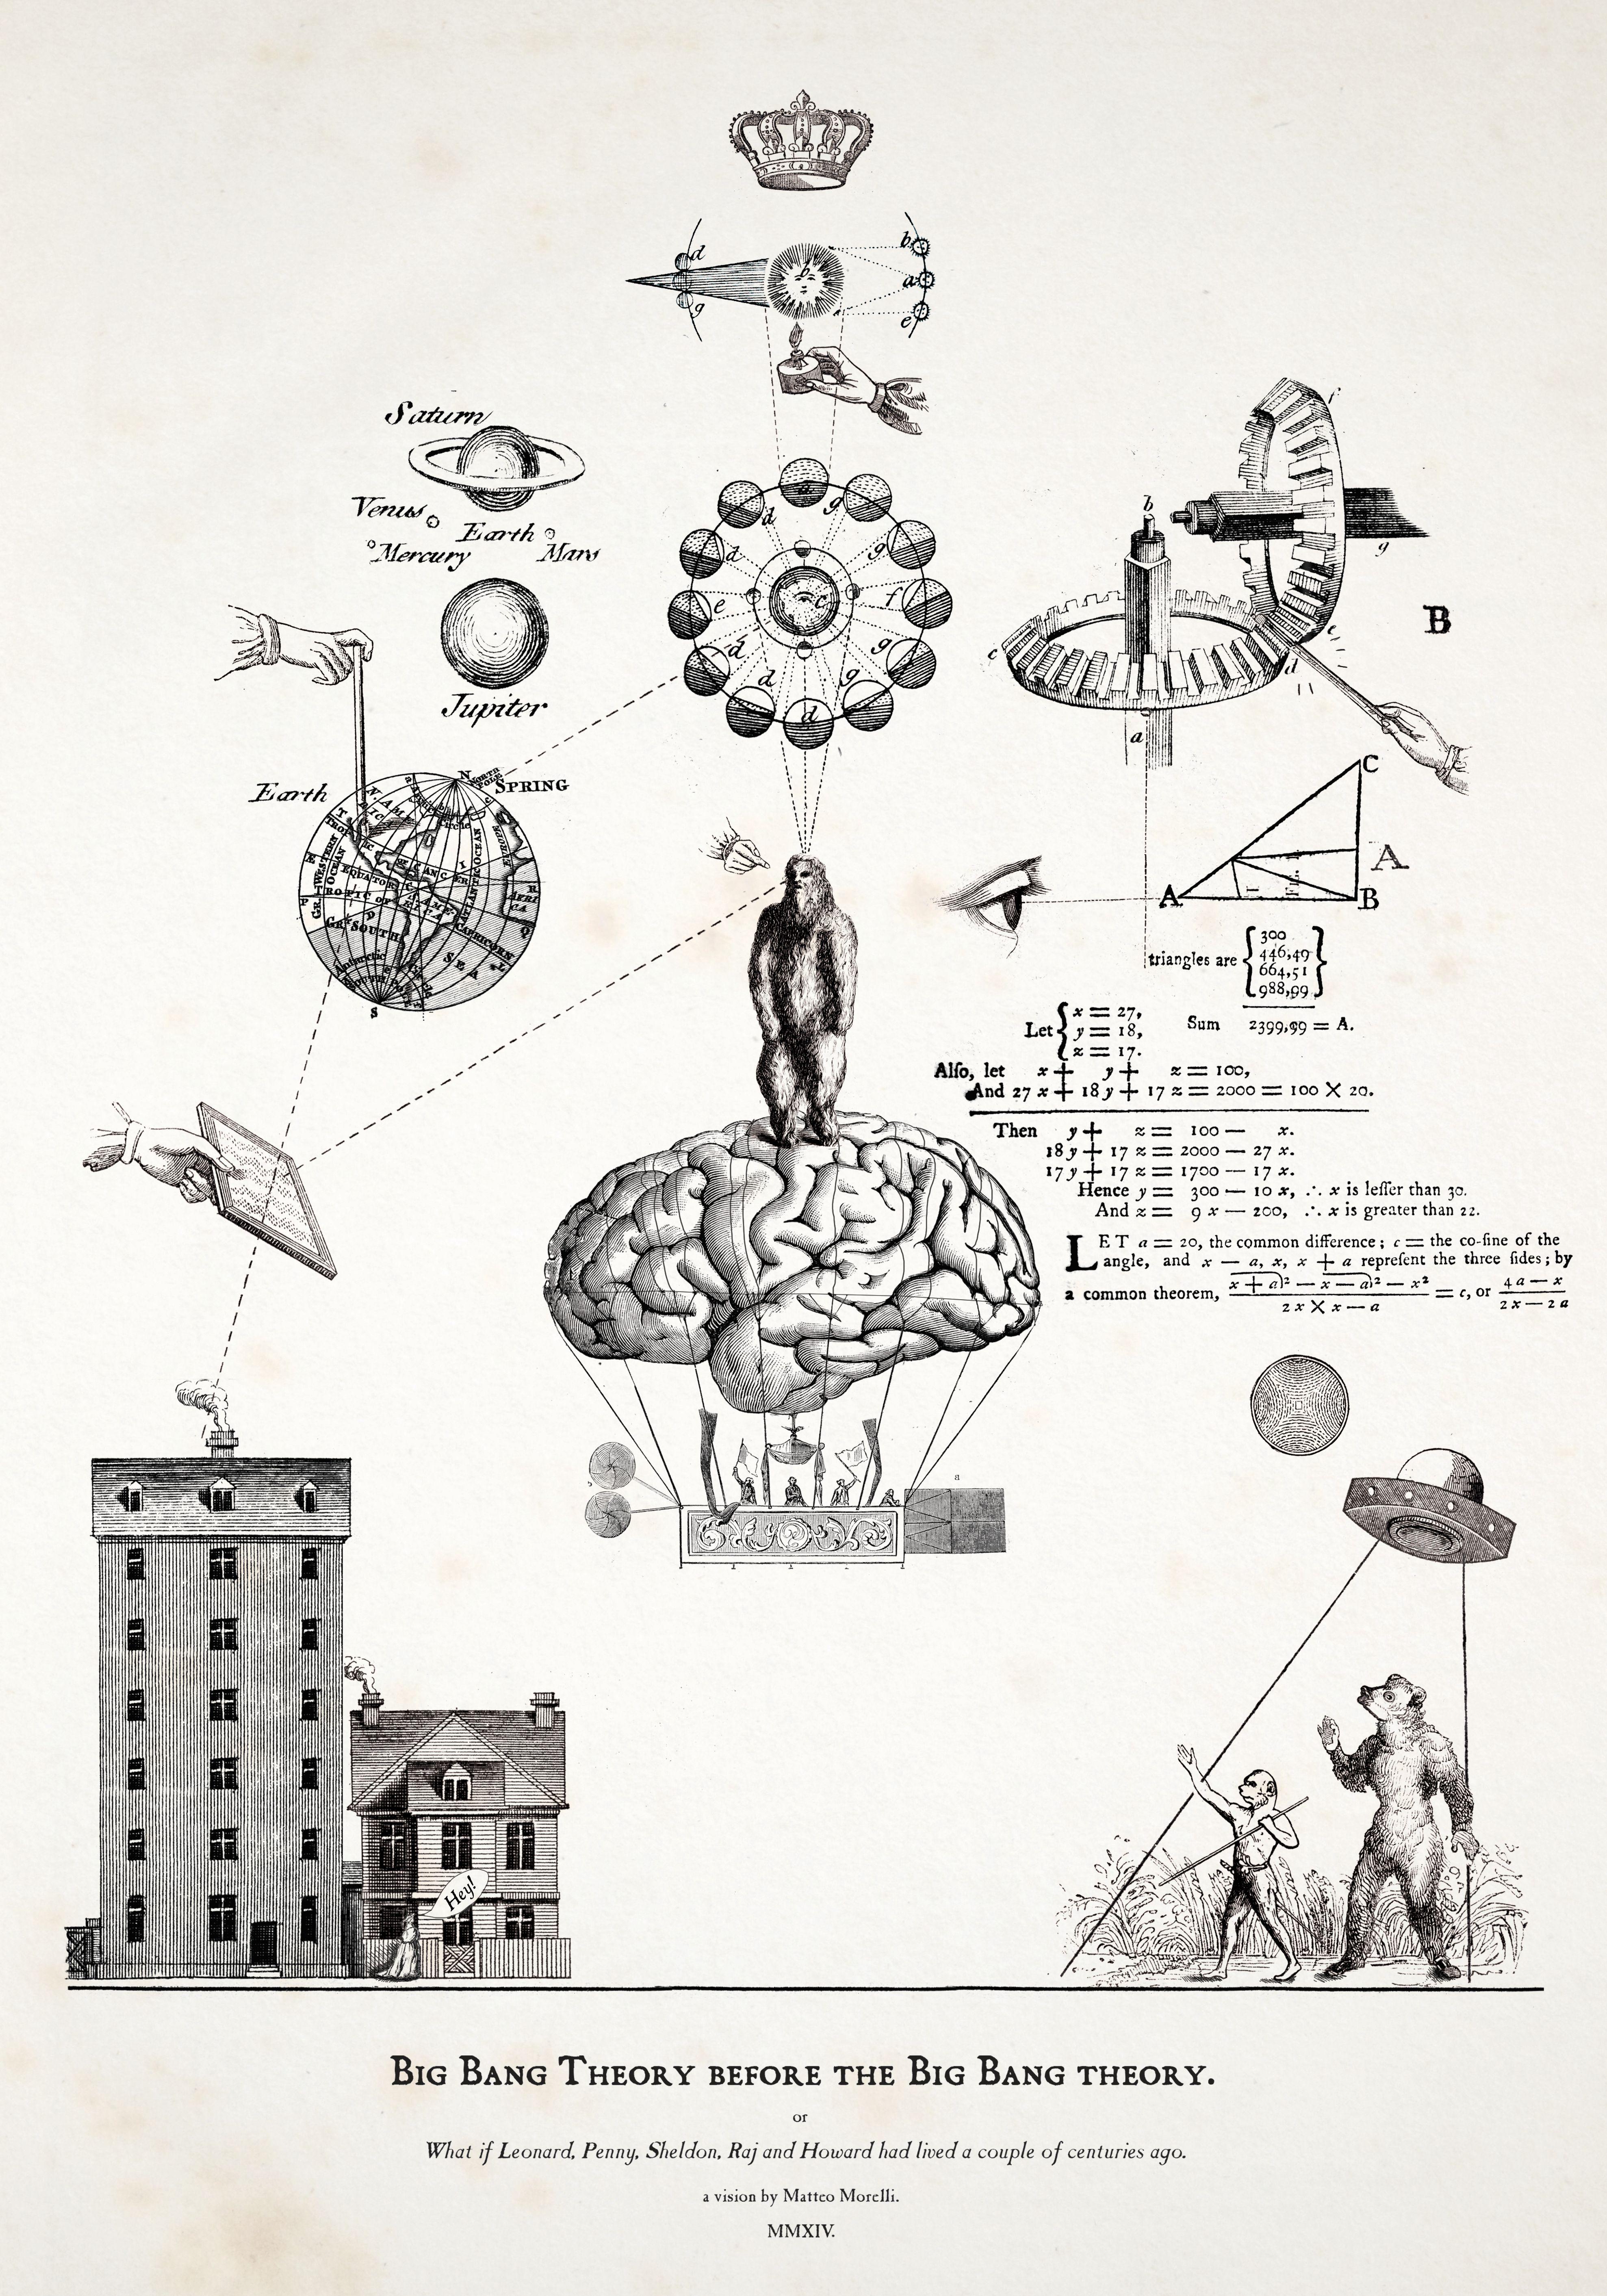 La mostra di The Big Bang Theory: l'opera di Alessandro Morelli